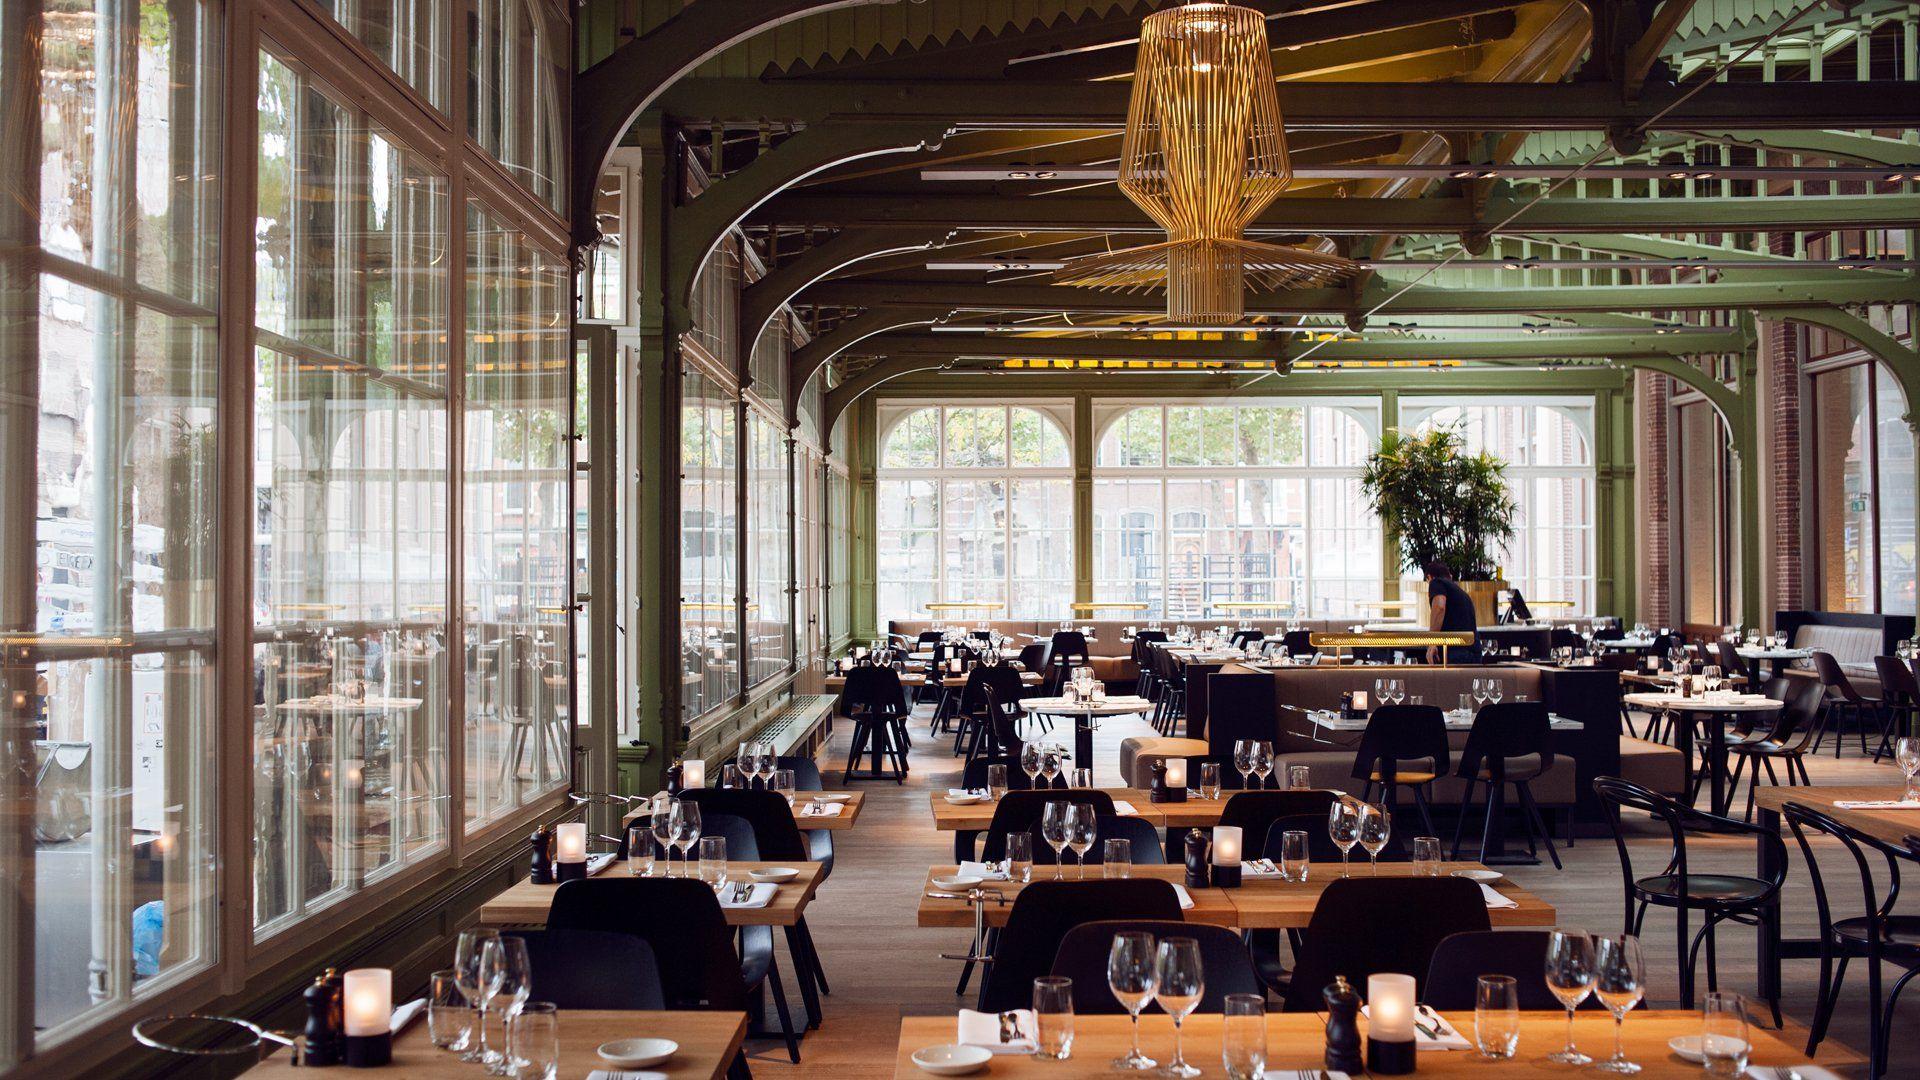 cafe-restaurant-de-plantage_Teska-Overbeeke_1920x1080.jpg